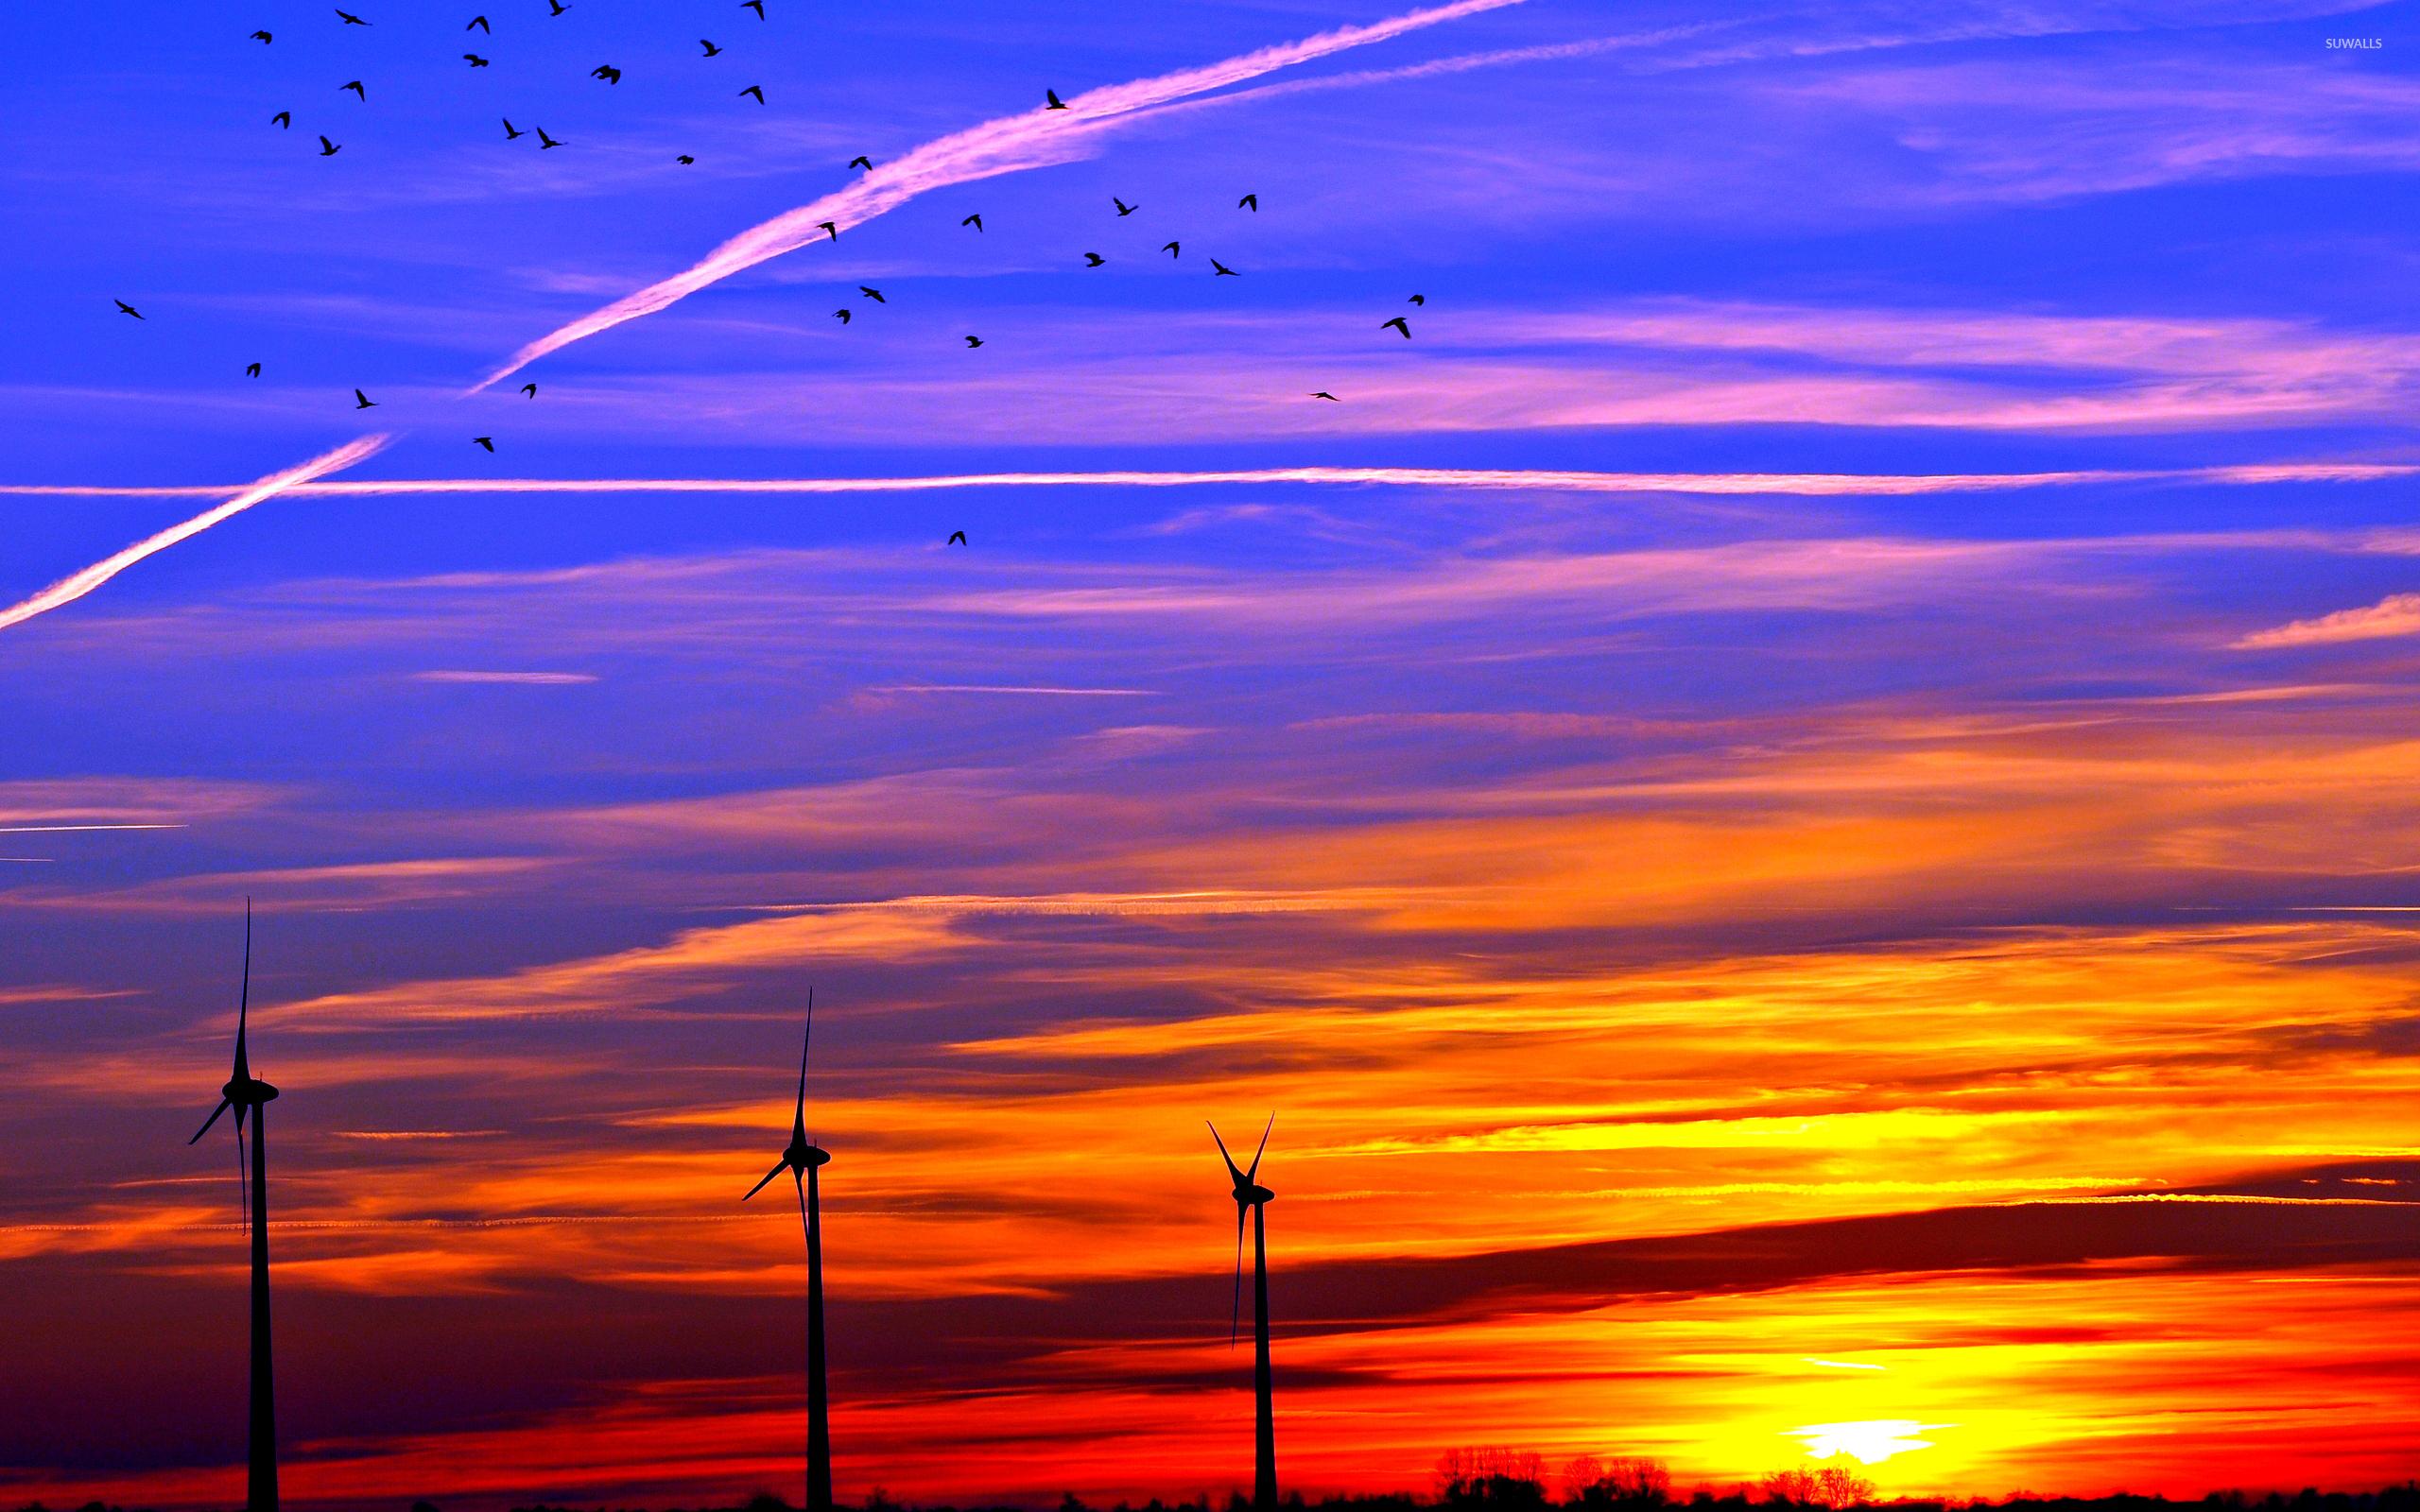 Fall Farm Desktop Wallpaper Colorful Sunset Over The Wind Turbines Wallpaper